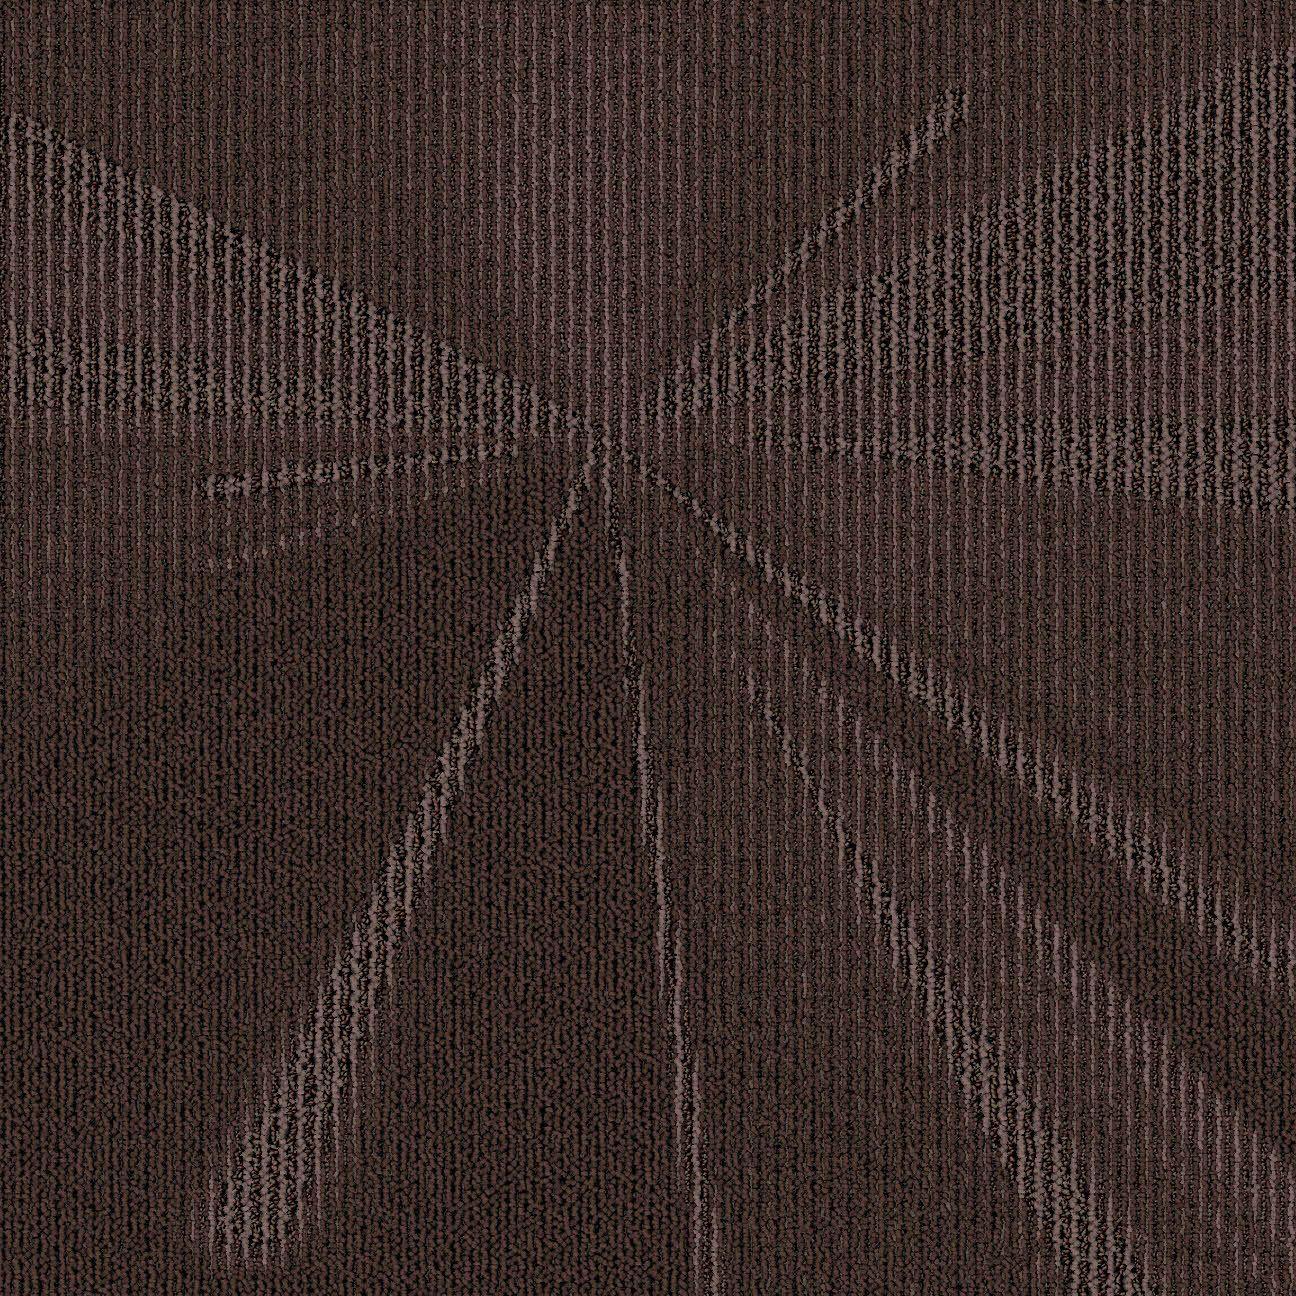 Masland Contract Organics Collection www.maslandcontract.com #interiordesign #carpet